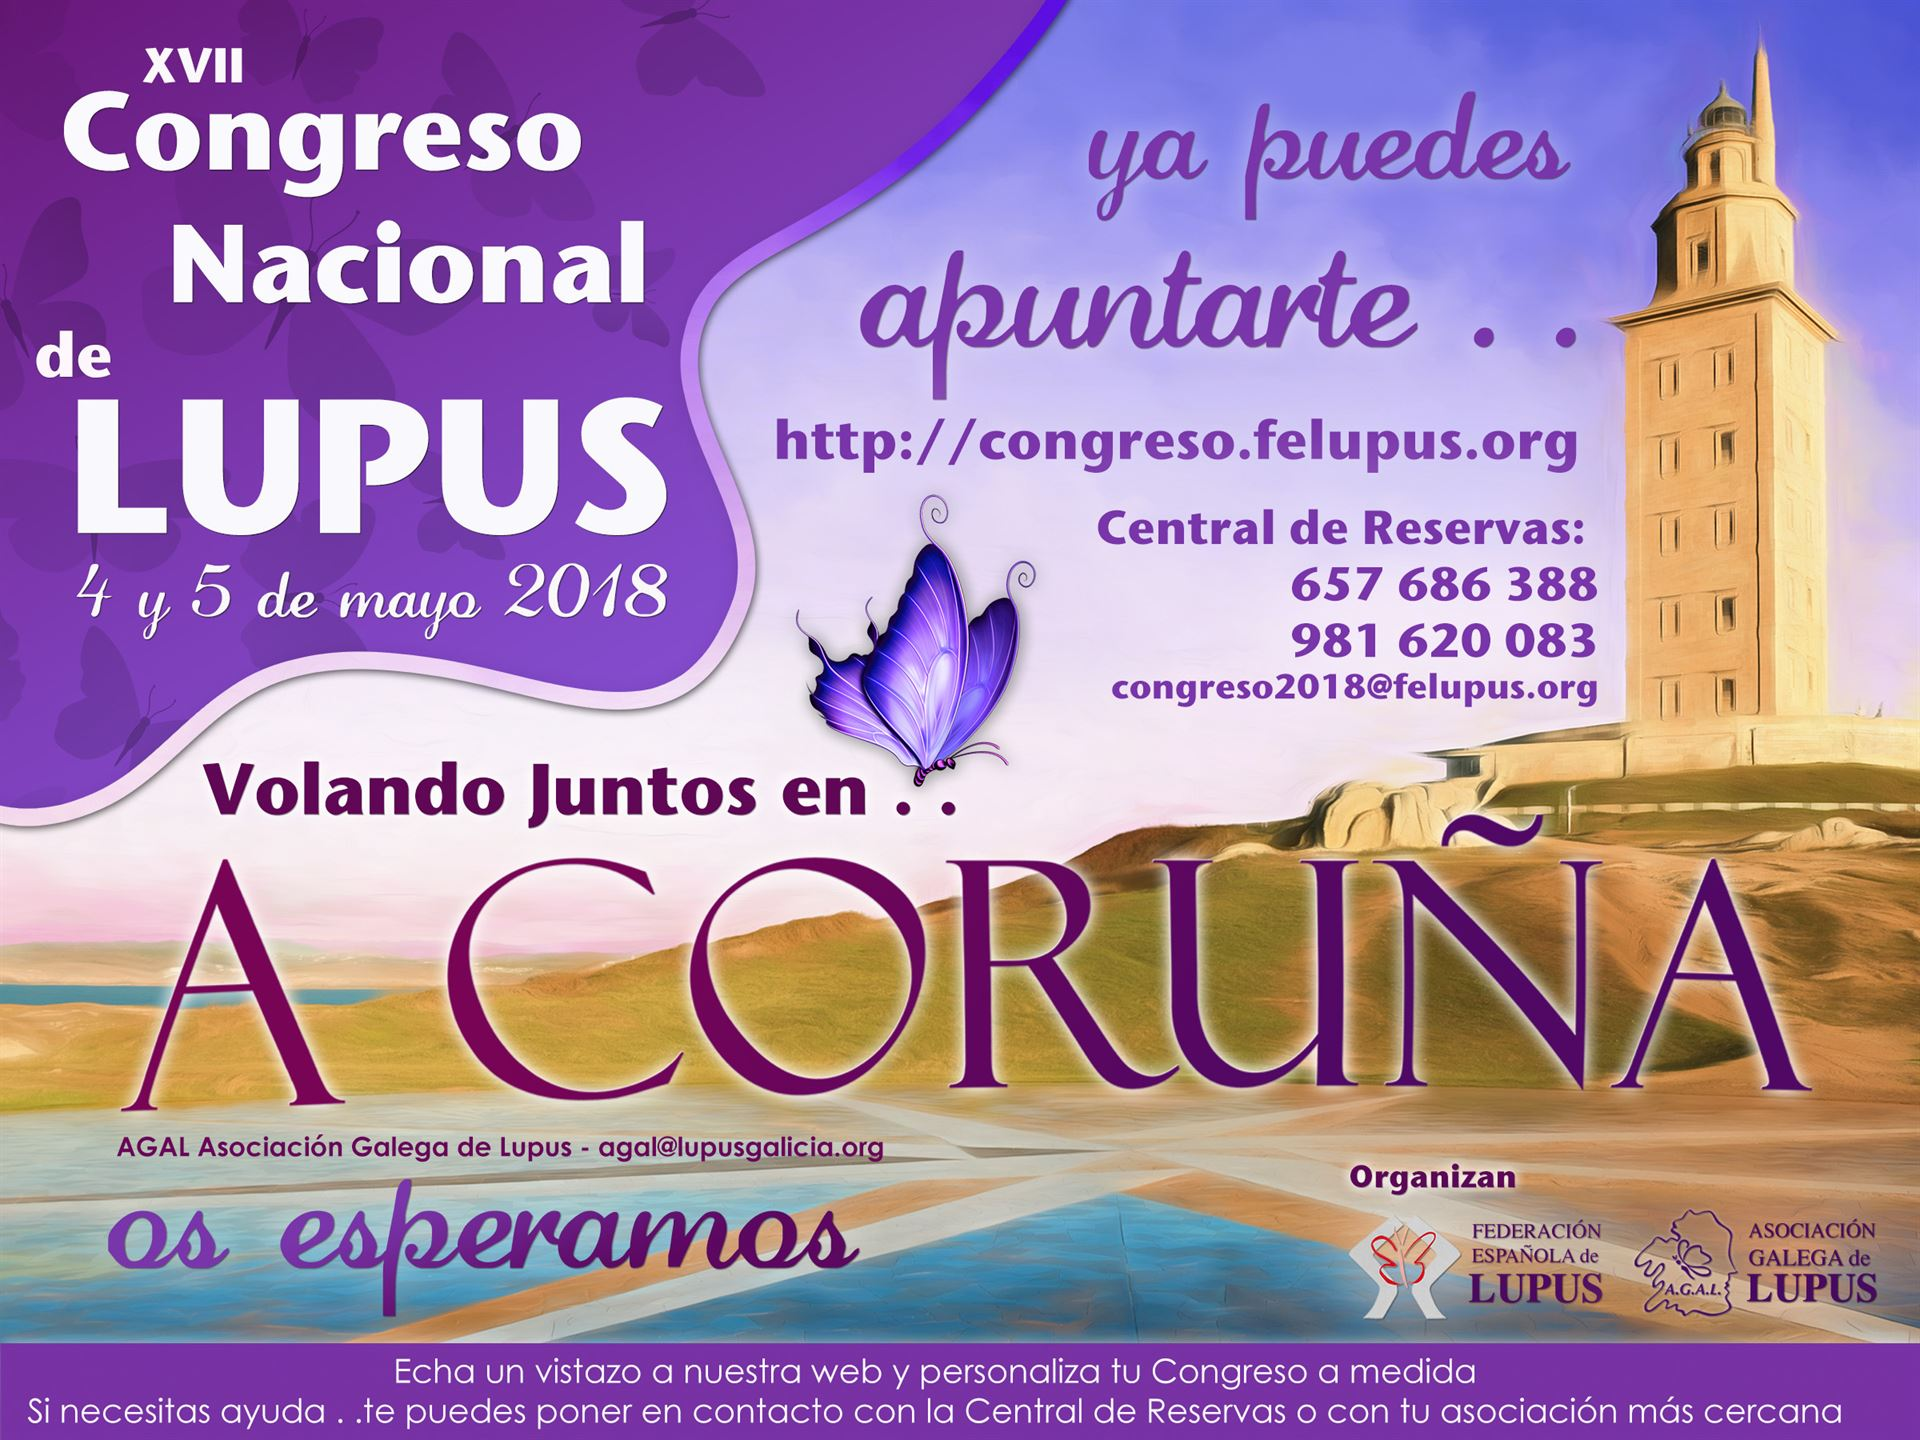 Congreso Nacional de Lupus Galicia